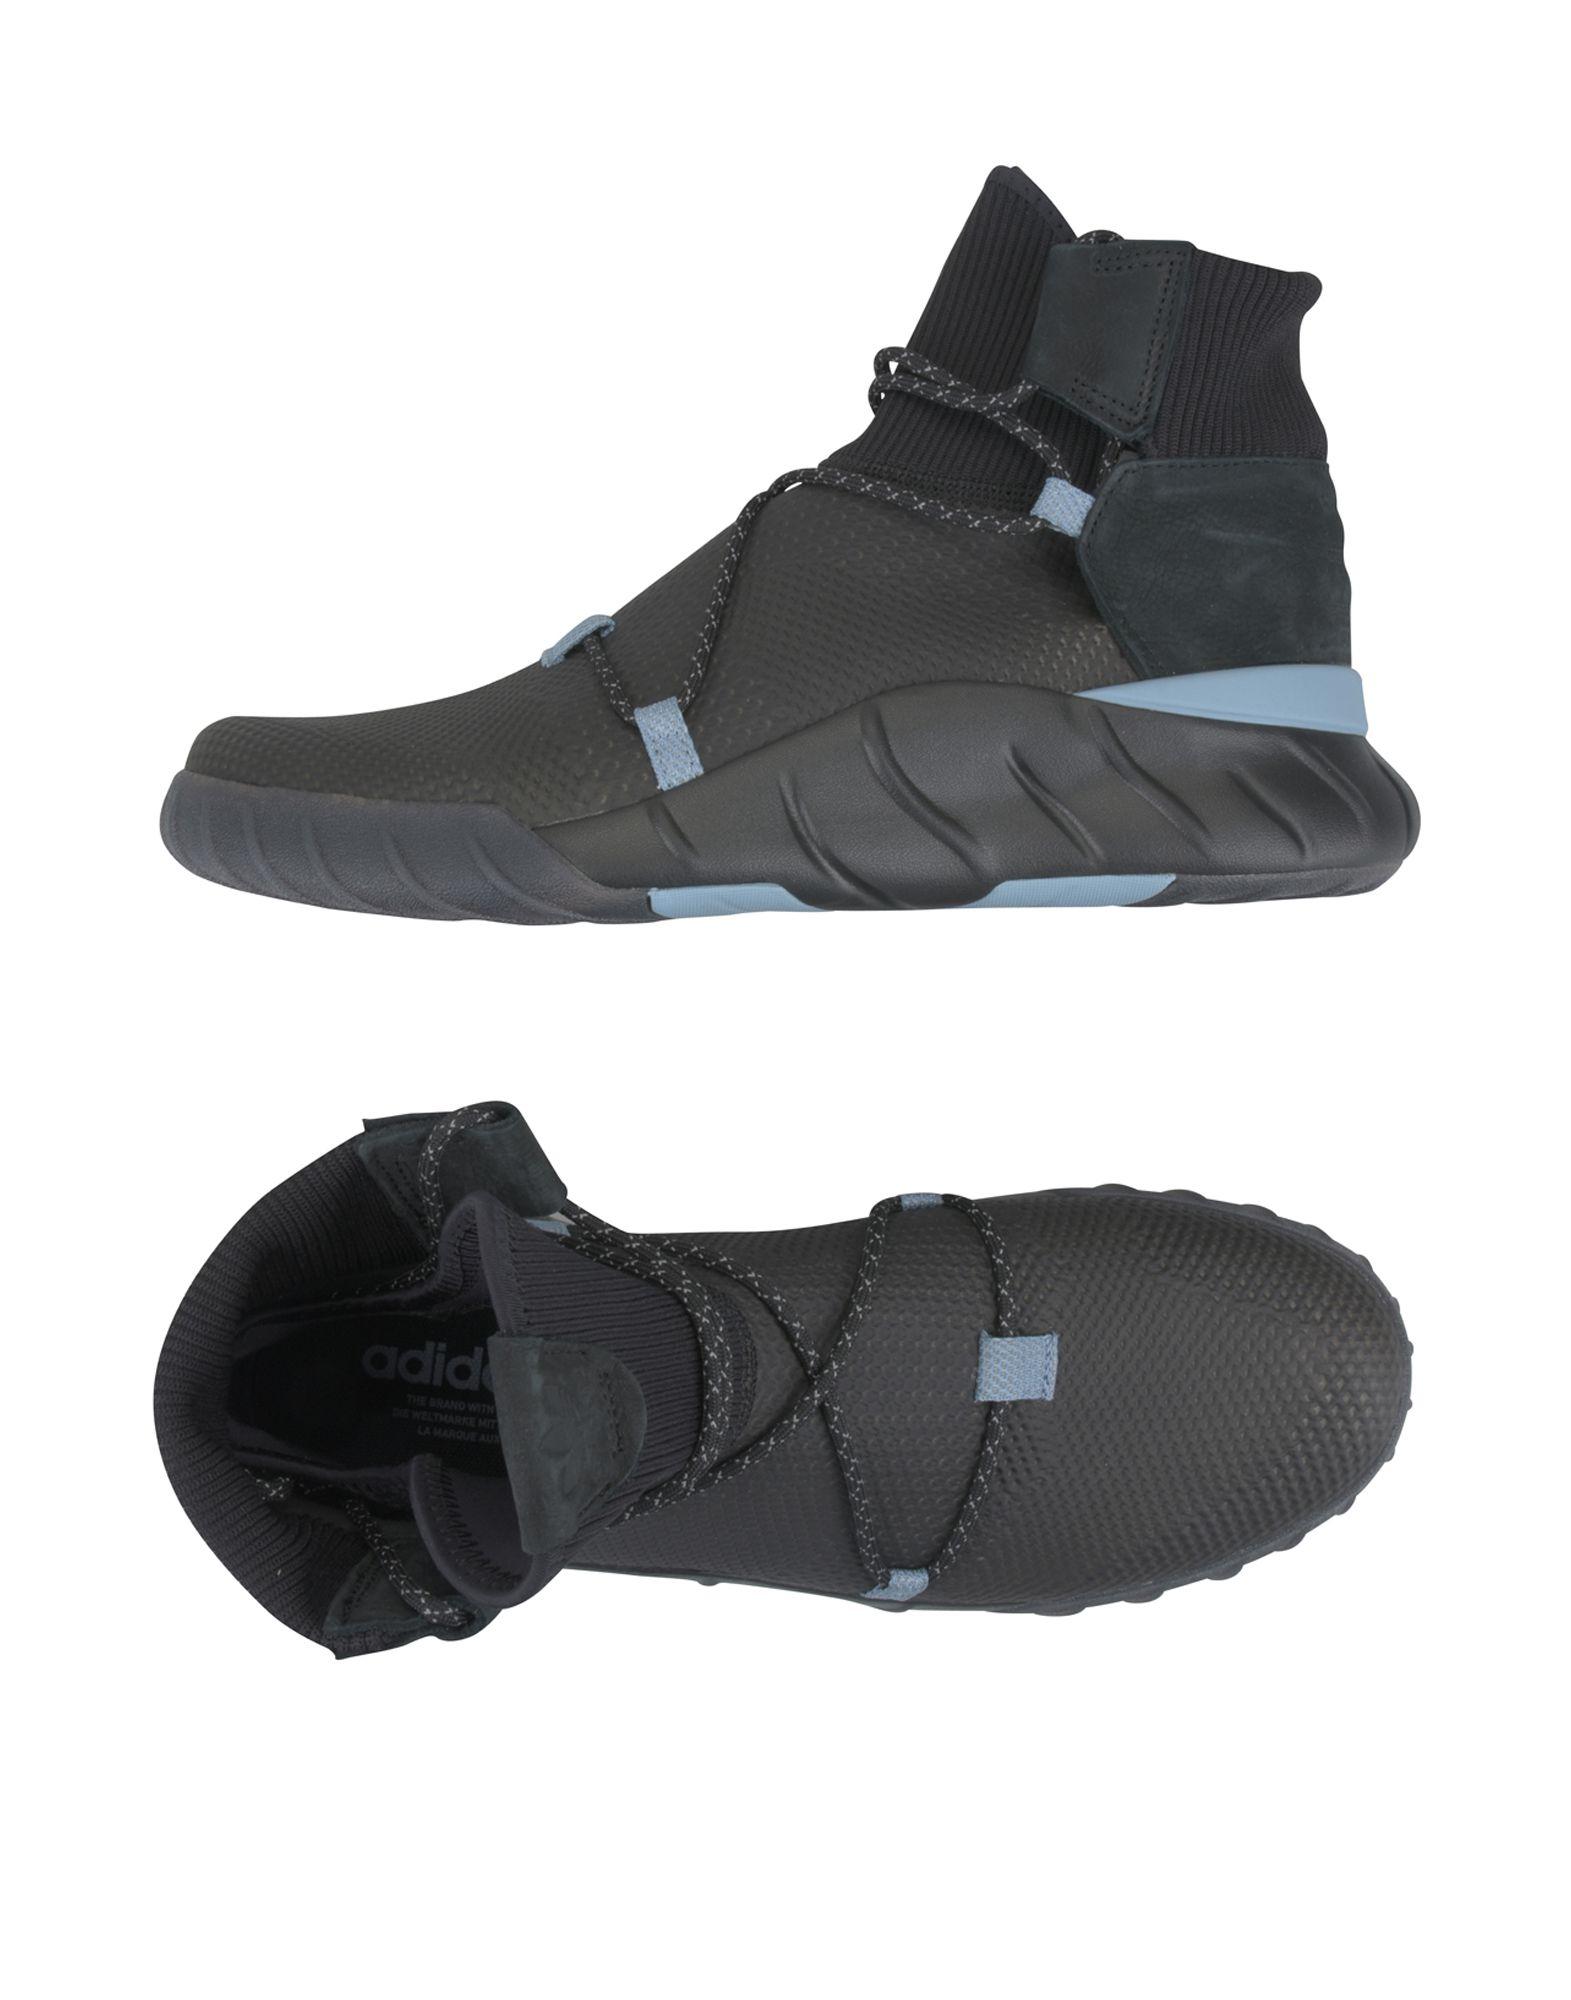 Sneakers Adidas Originals Tubular X 2.0 Pk - Uomo - Acquista online su